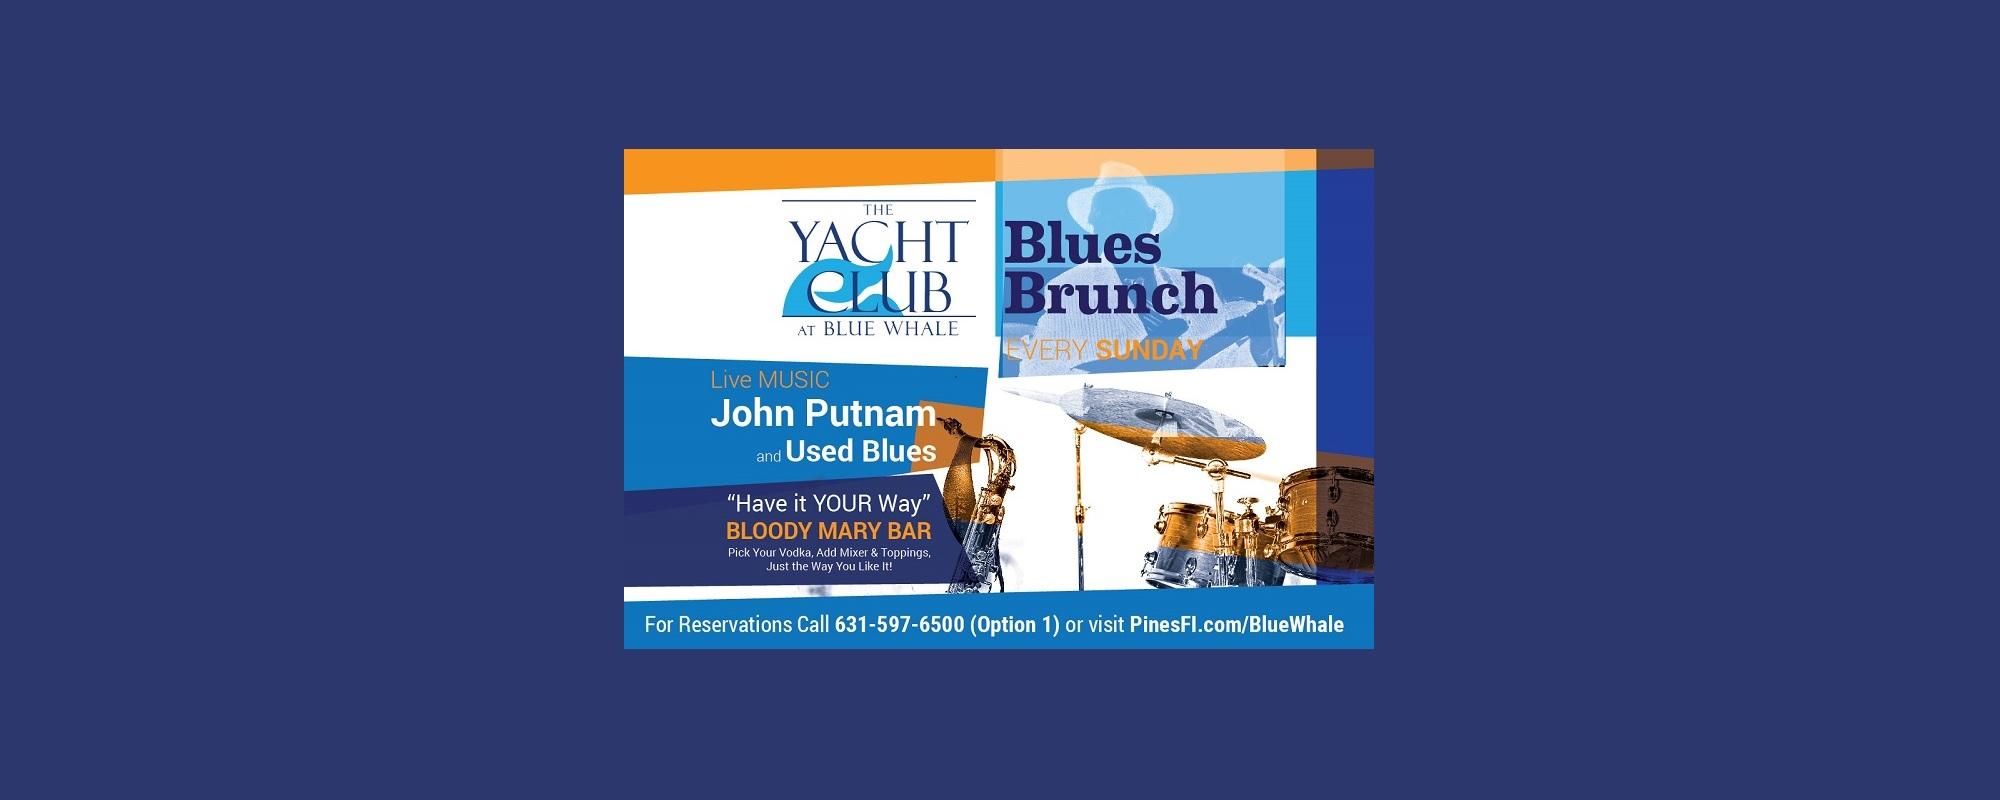 BluesBrunch-HomePageBannerMain